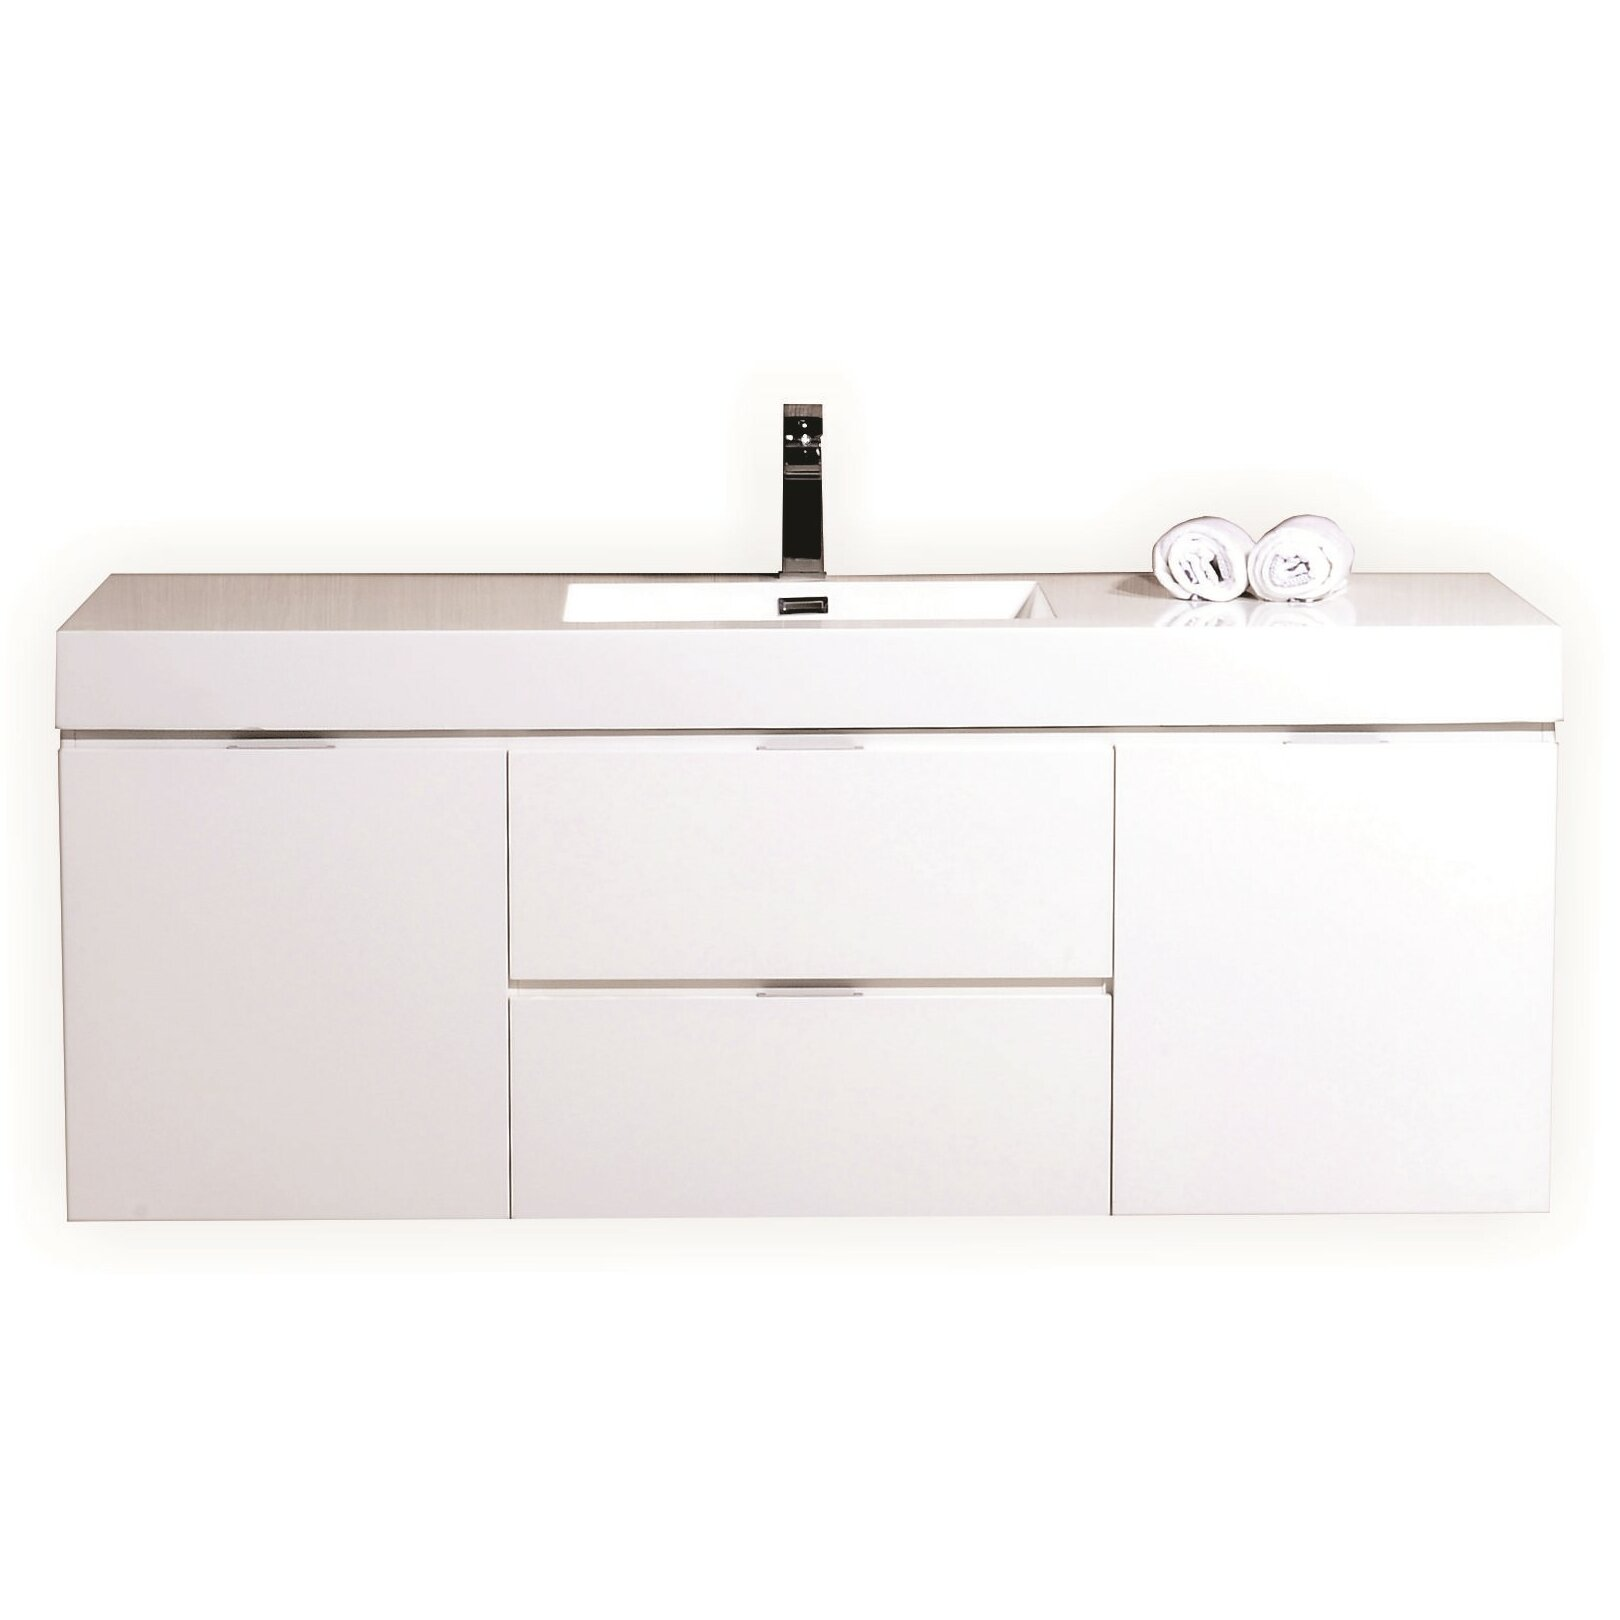 Kube Bath Bliss 60 Single Wall Mount Modern Bathroom Vanity Set Reviews Wayfair